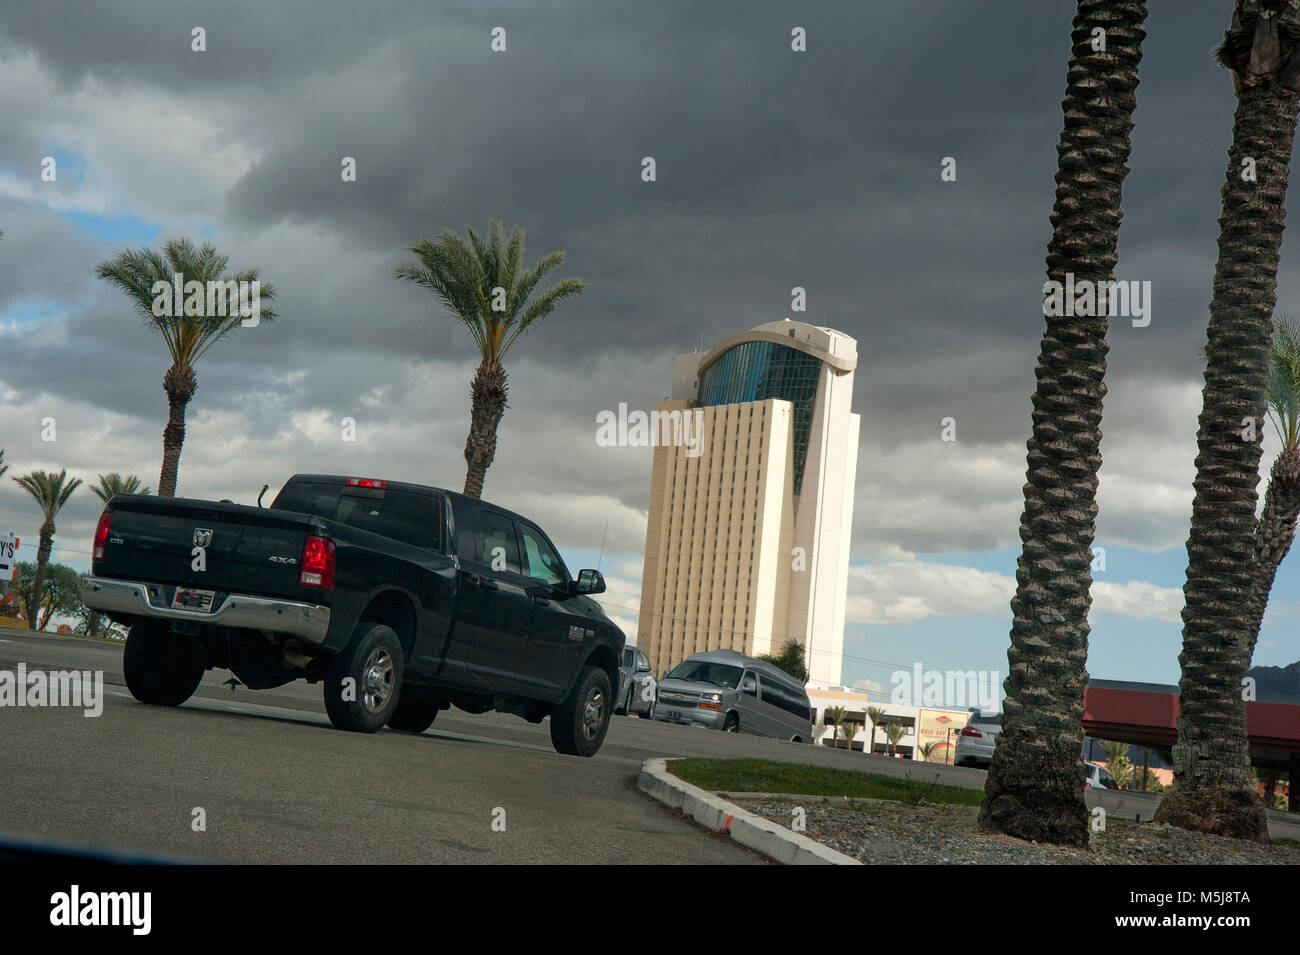 Morongo Indian Casino near Palm Springs, CA - Stock Image